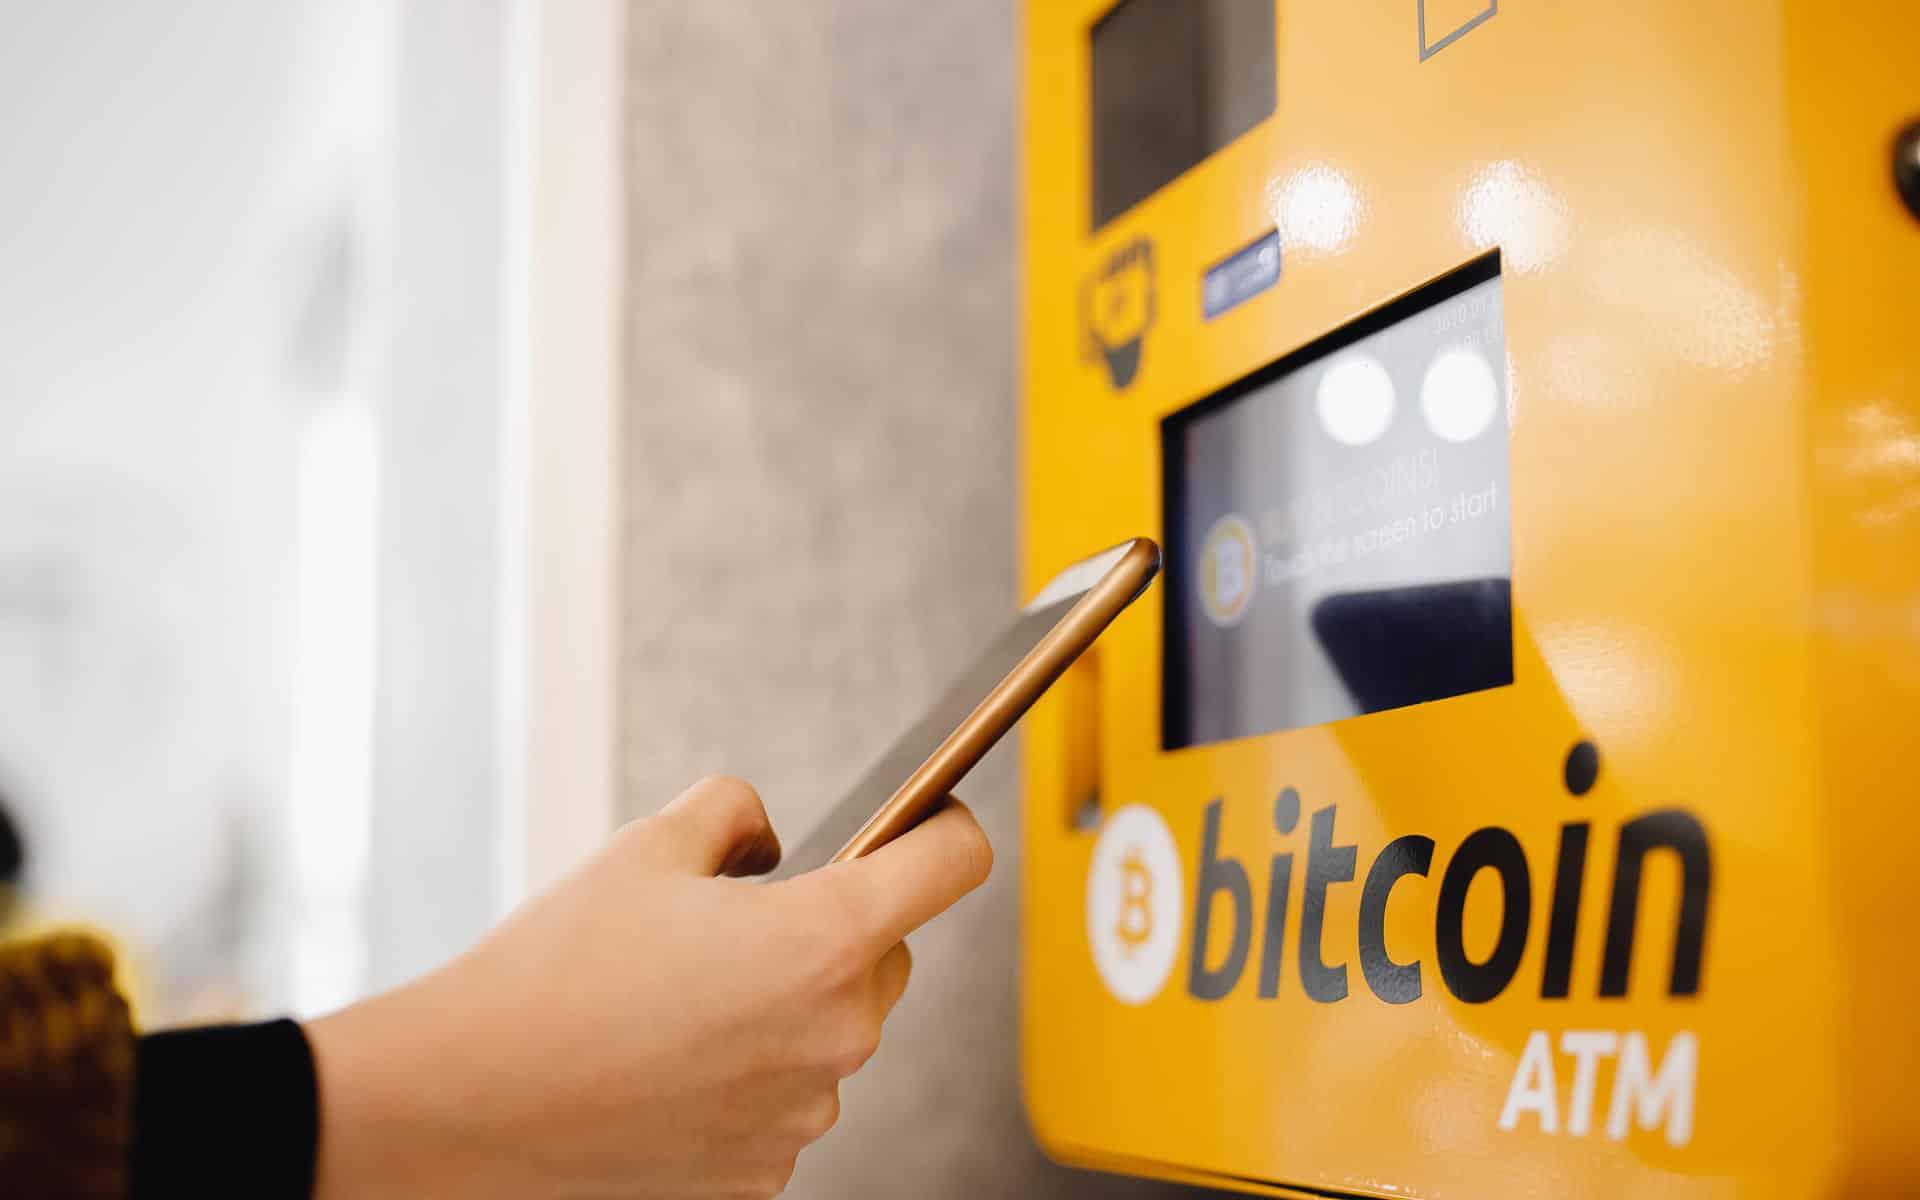 Bitcoin ATM Venezuela